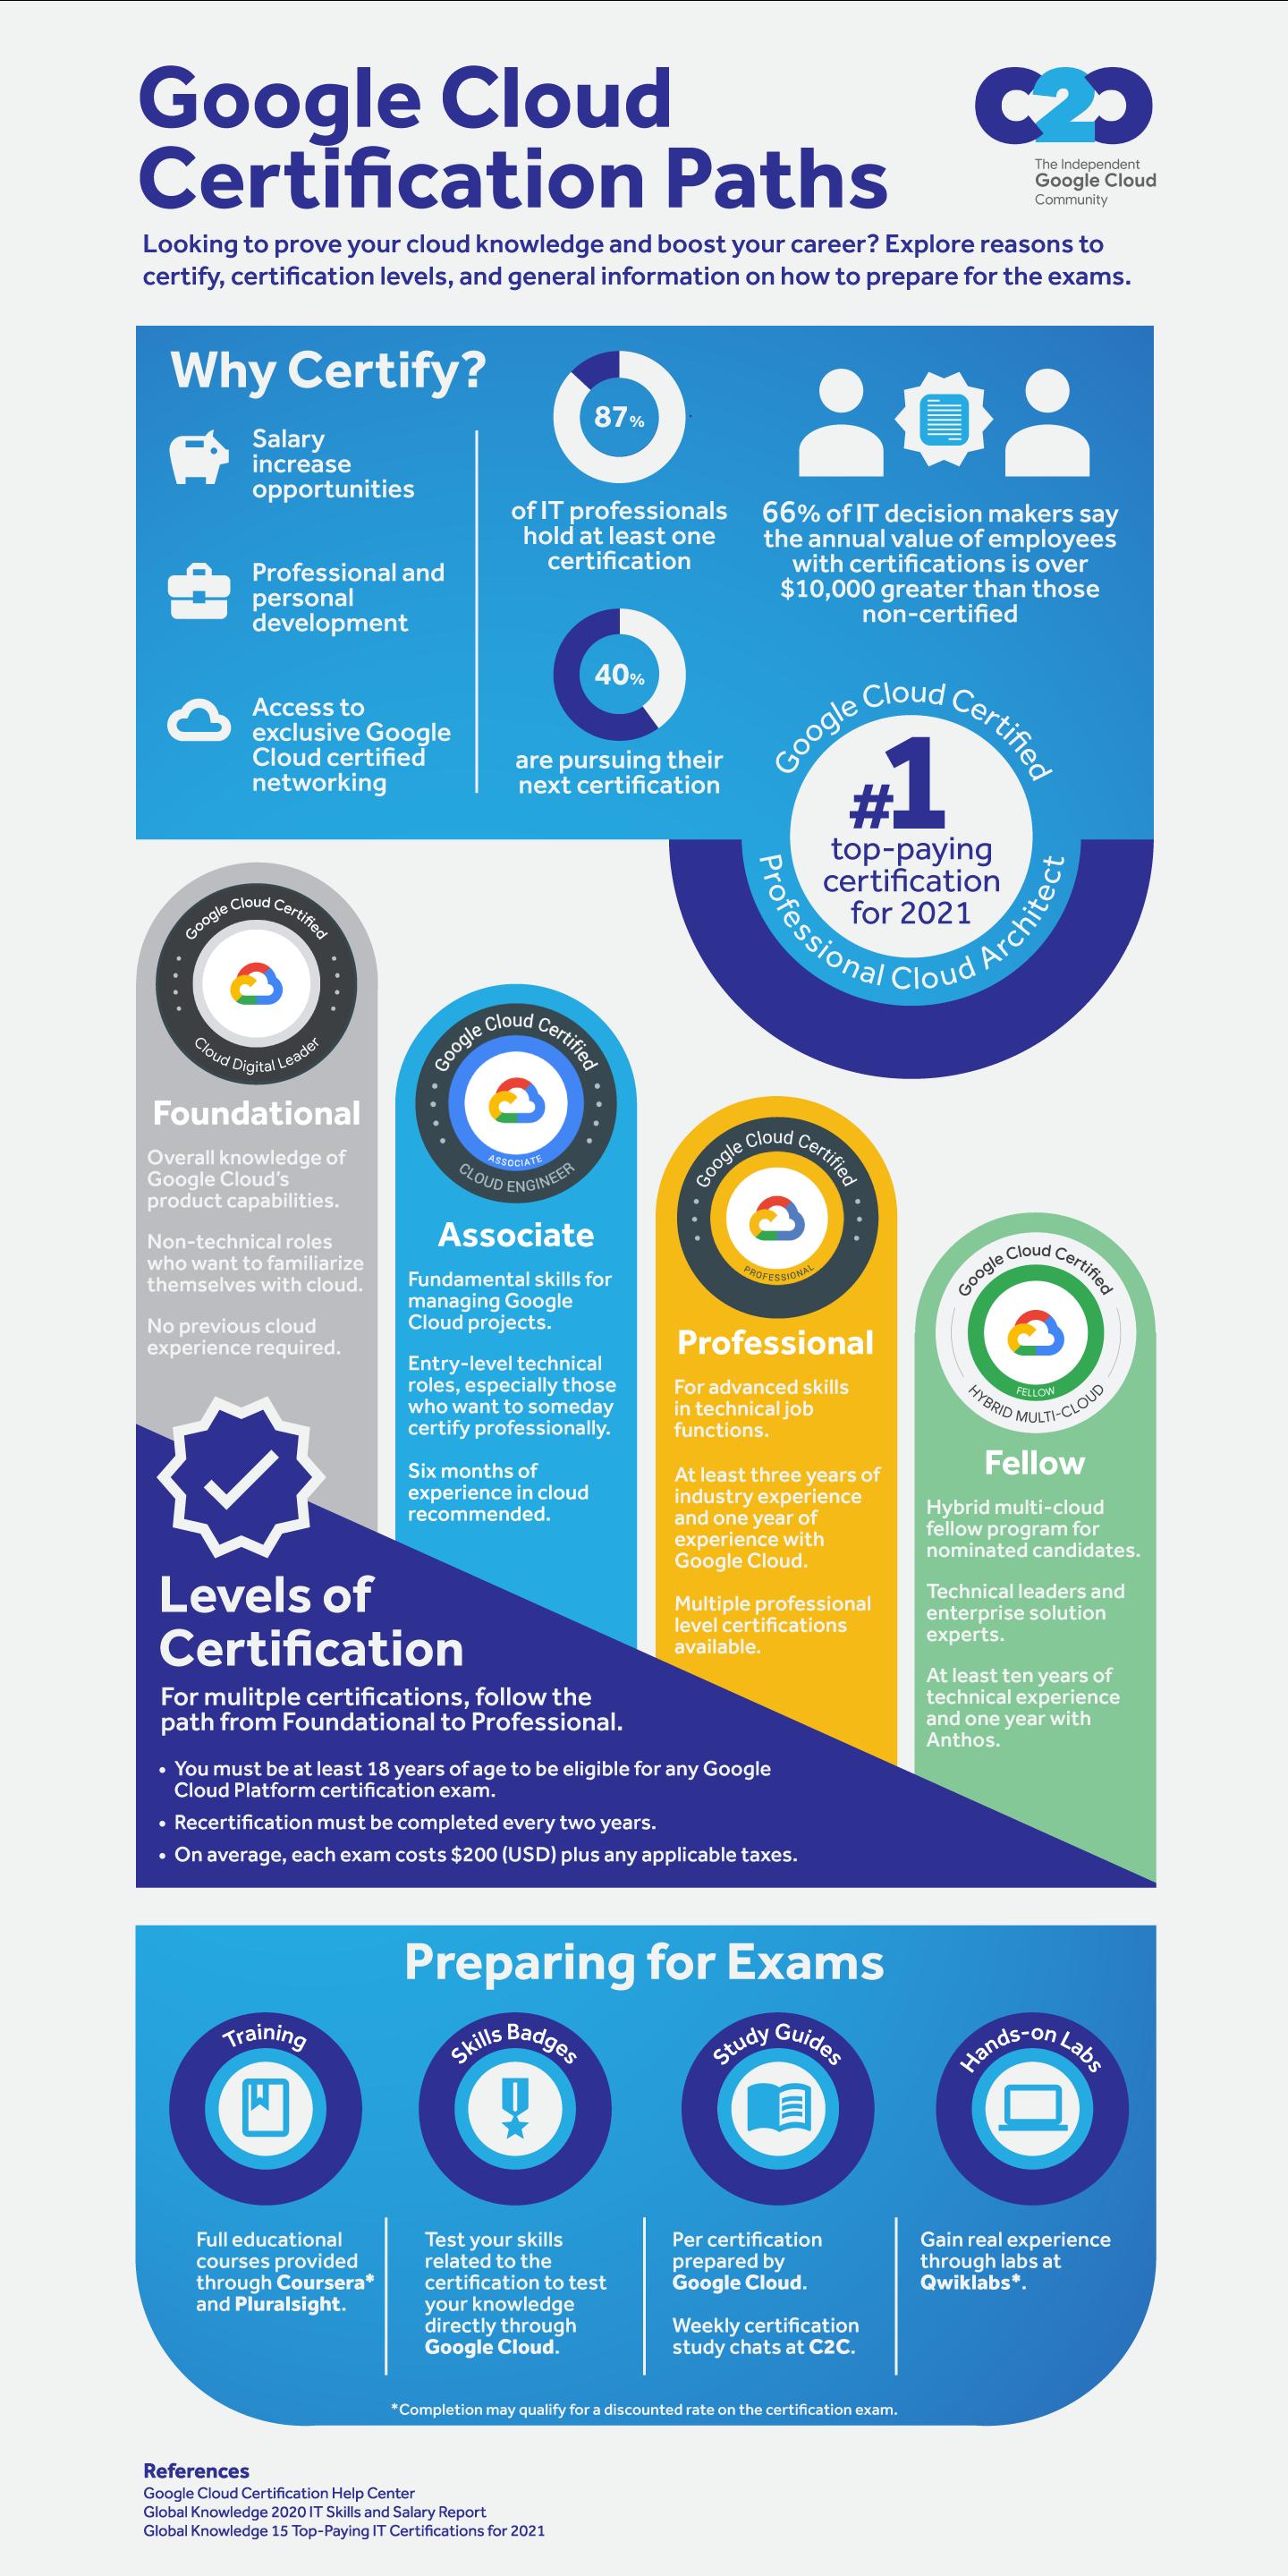 Infographic describing an overview of Google Cloud certification paths.